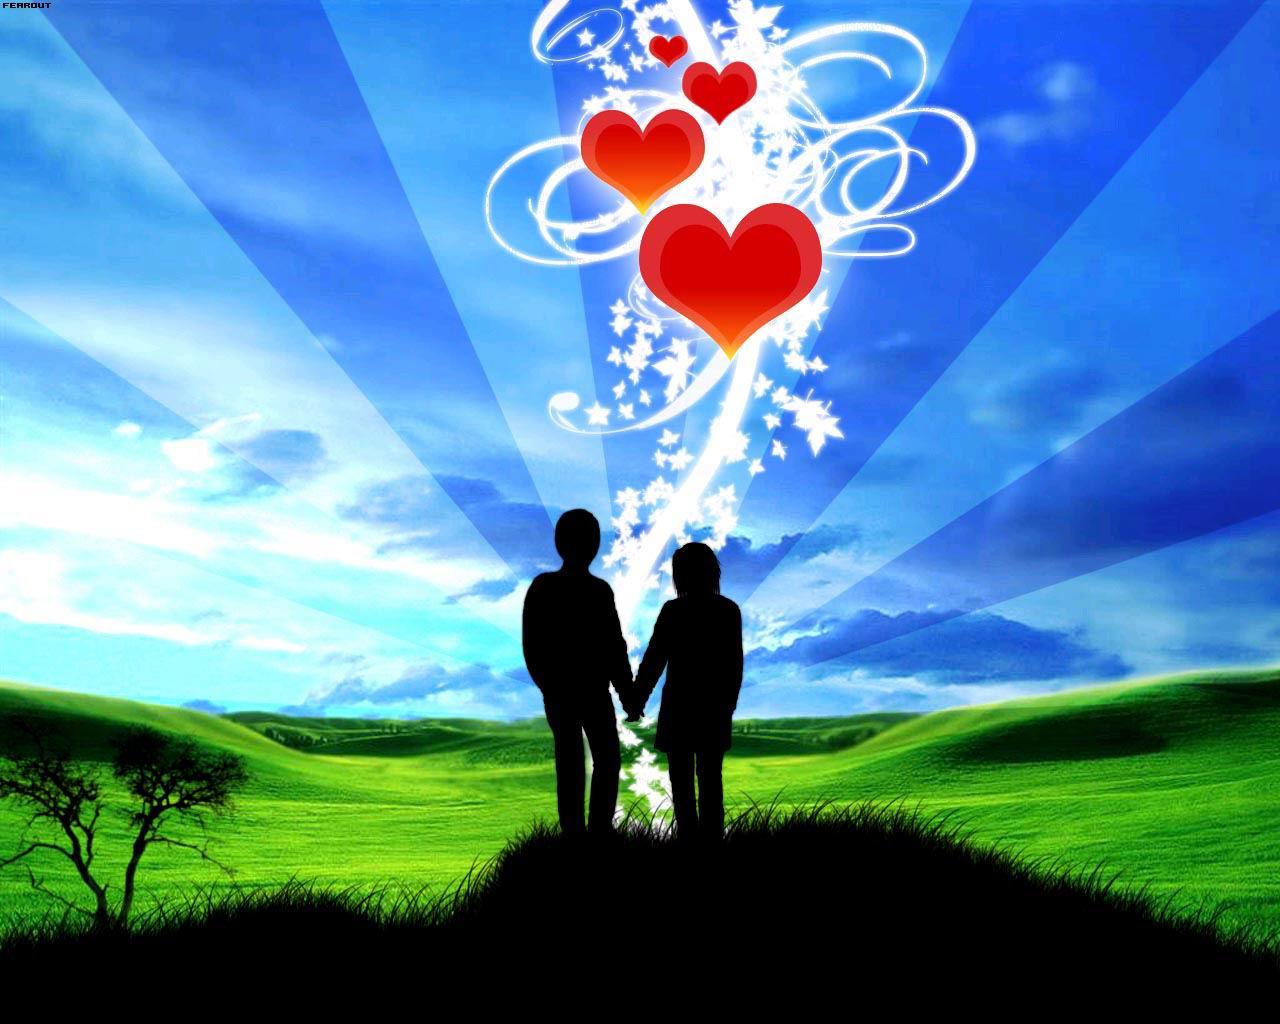 Love desktop wallpaper 0028 1280x1024